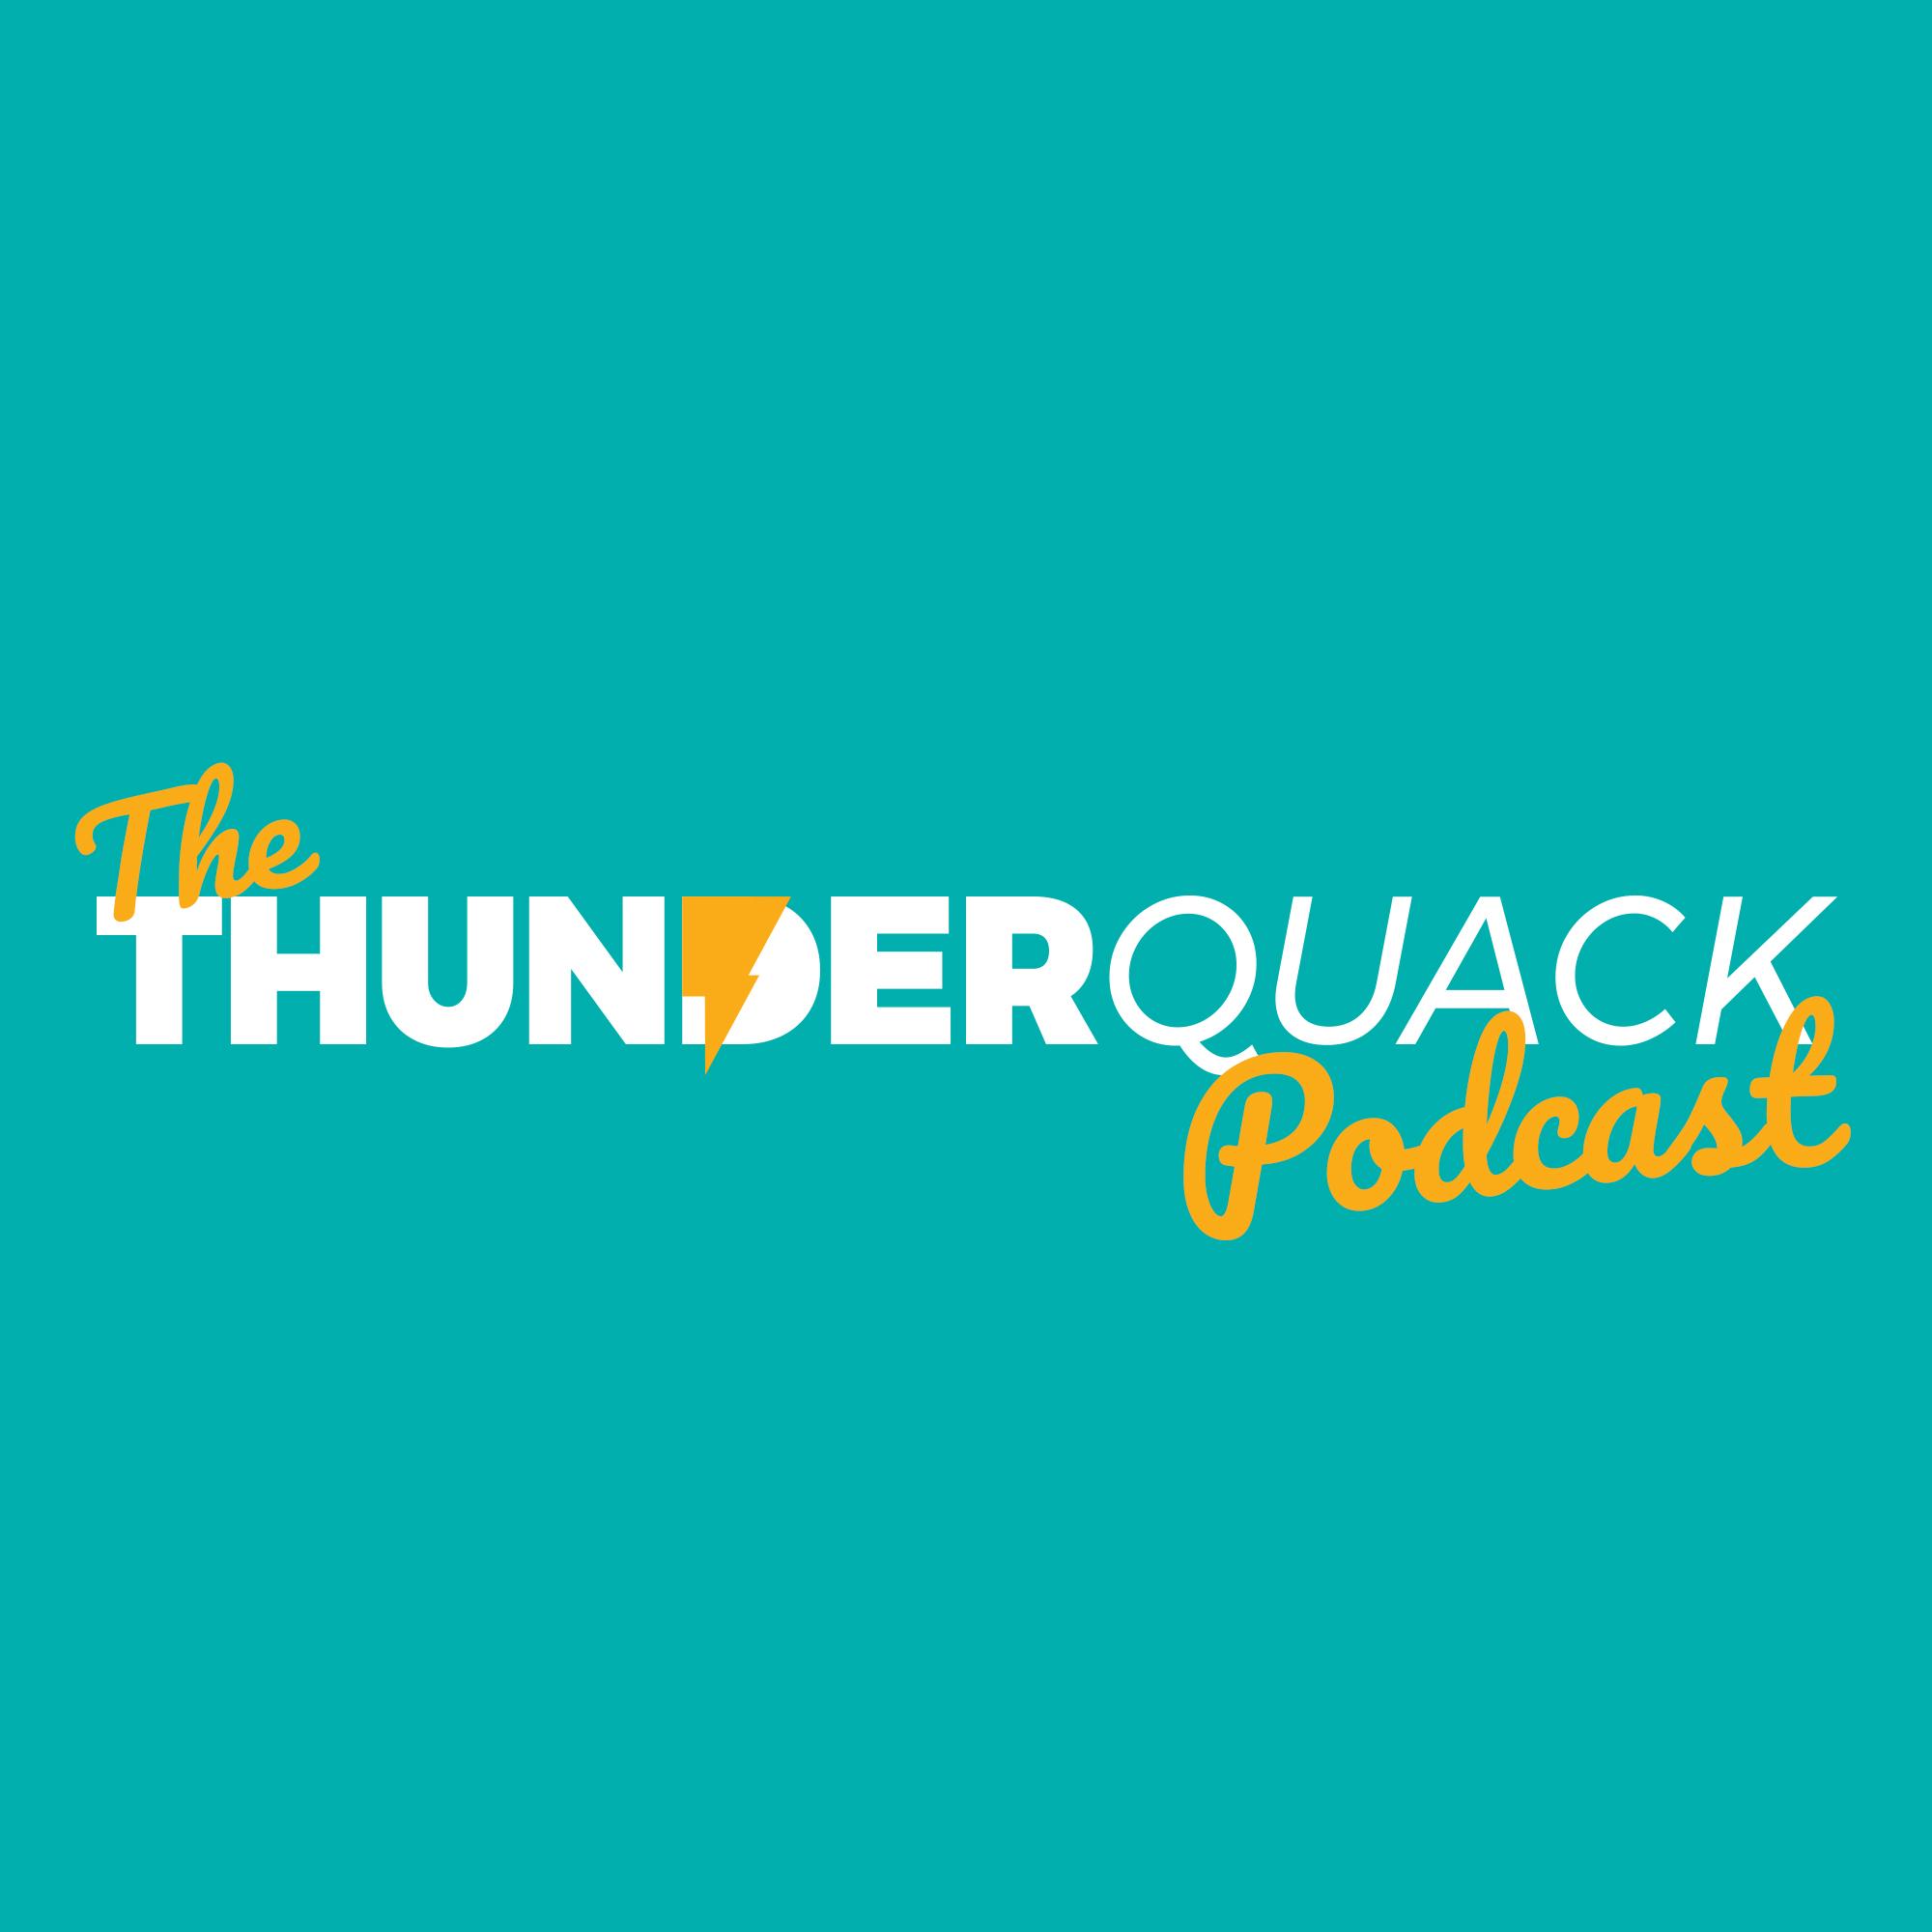 The ThunderQuack Podcast